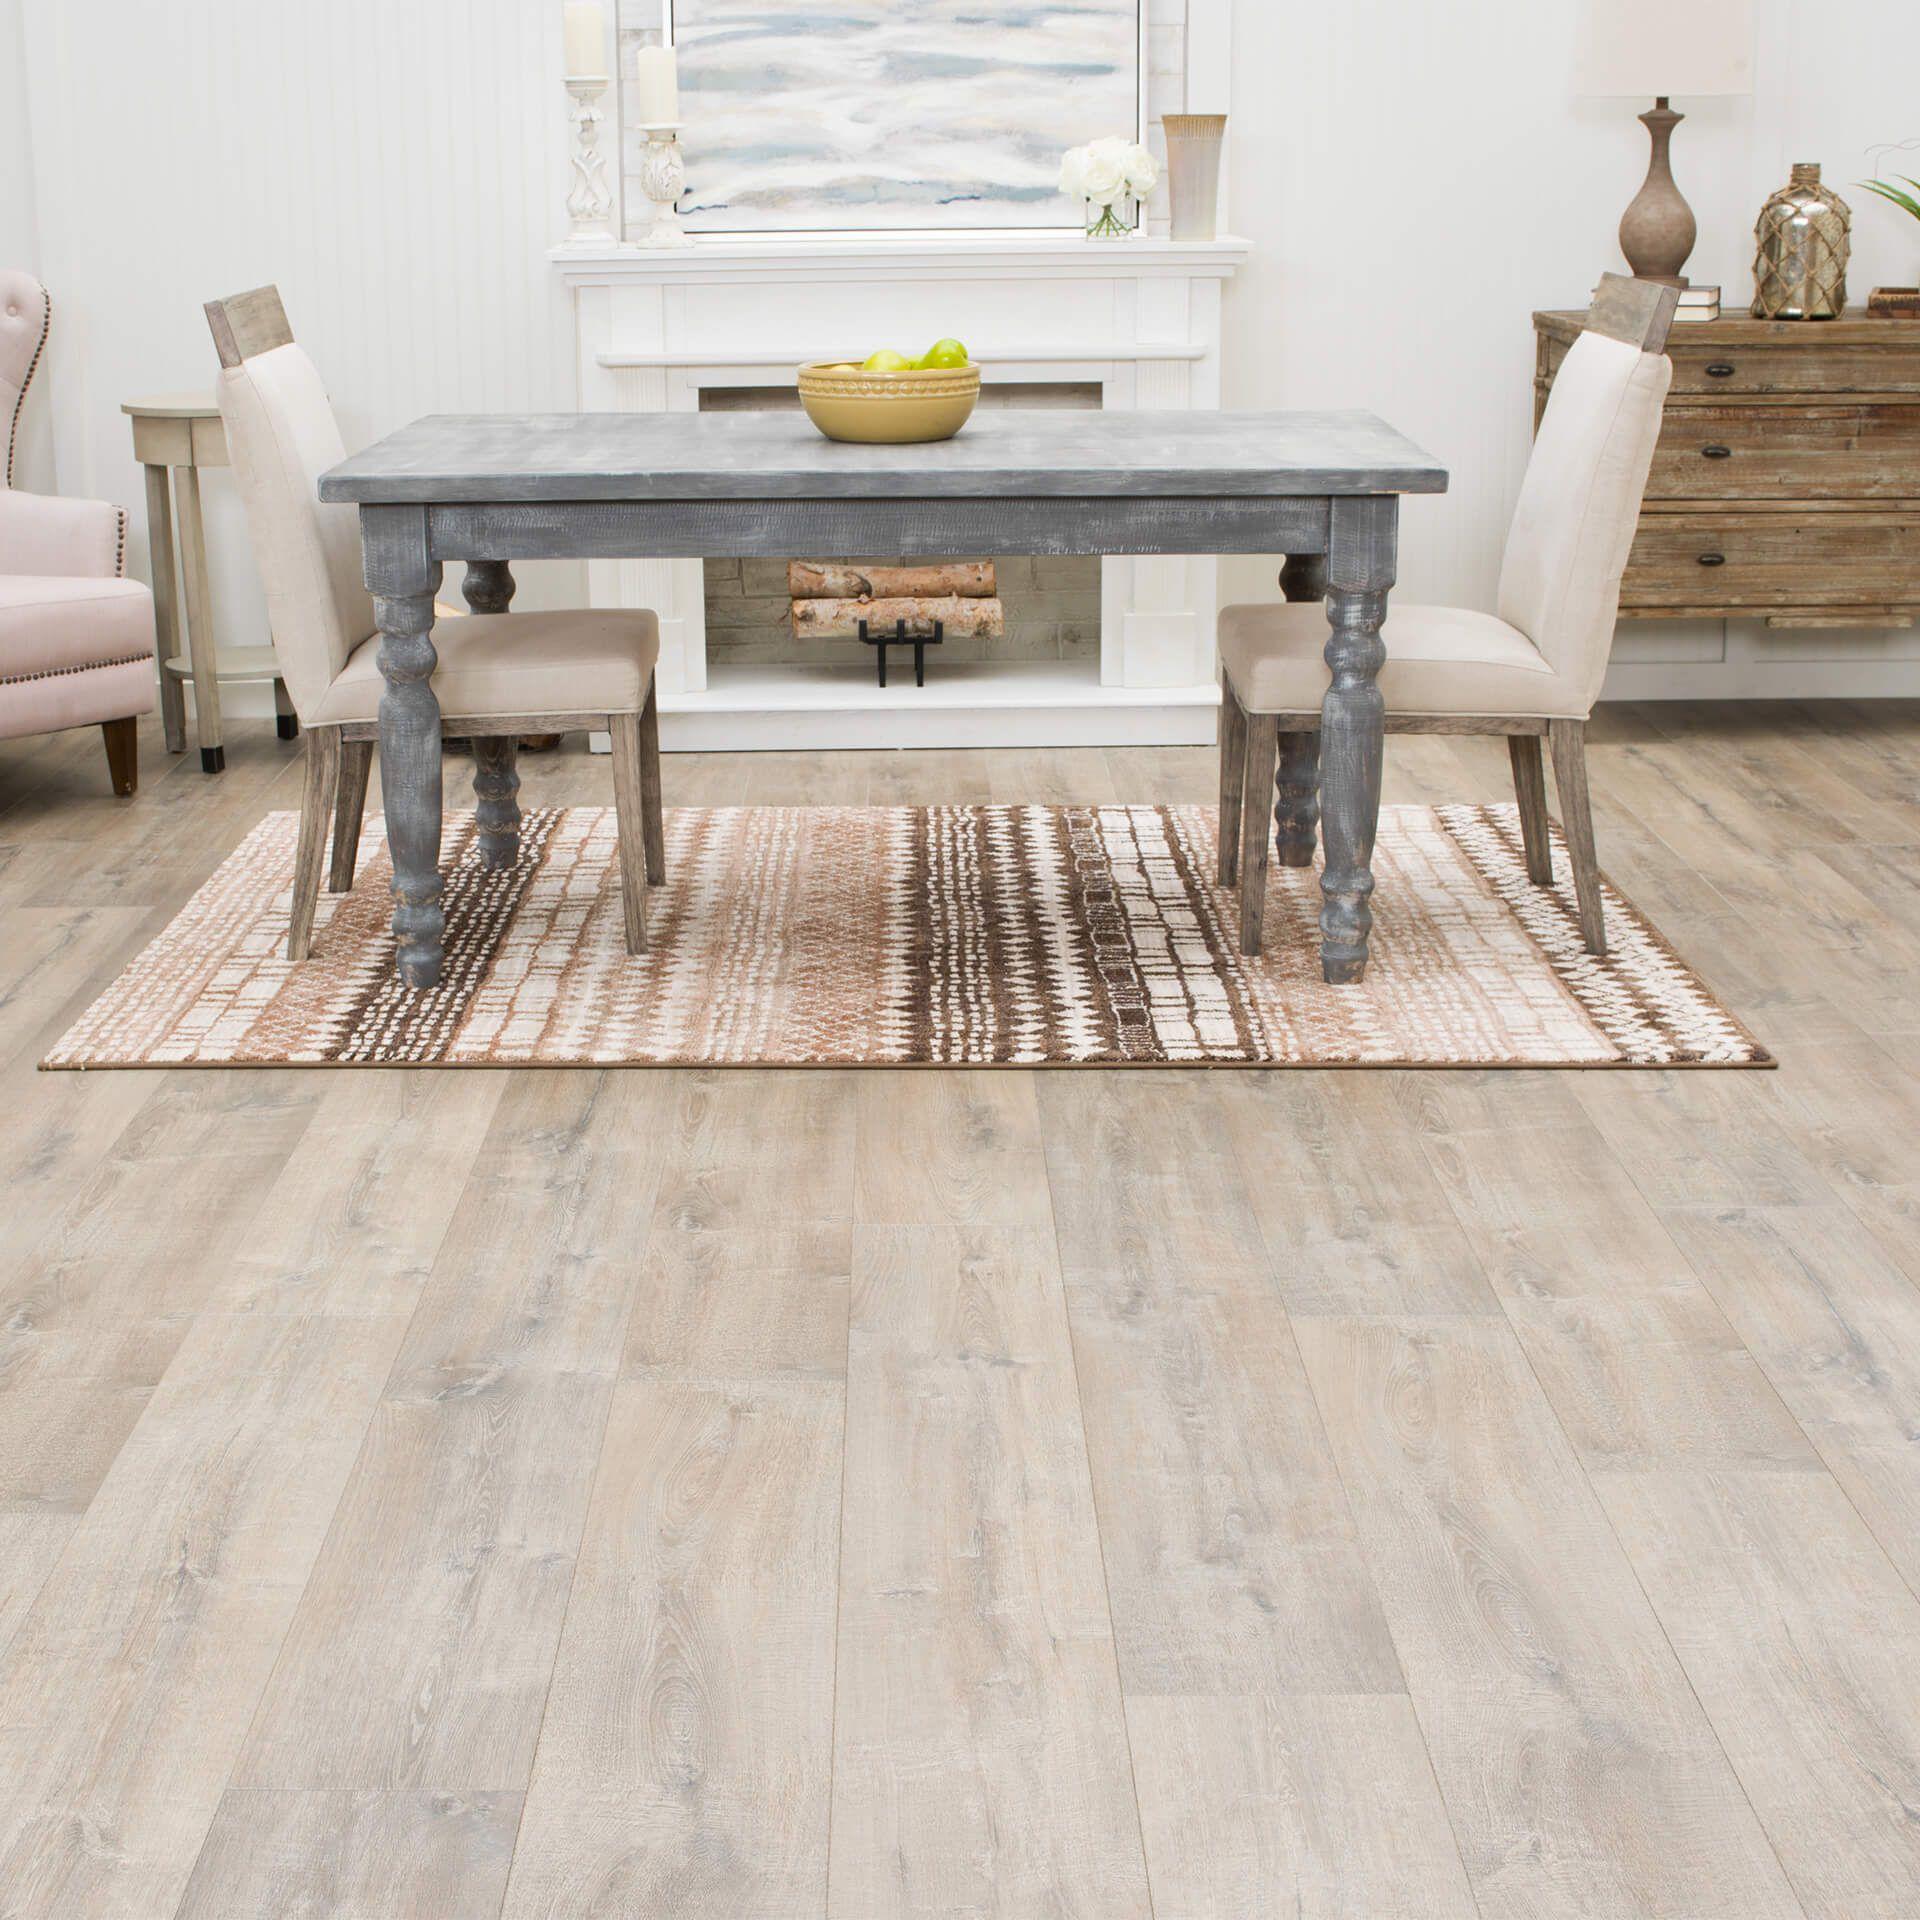 Providence Oak Quick Step In 2021 Quick Step Flooring Laminate Wood Flooring Colors Grey Laminate Flooring Kitchen